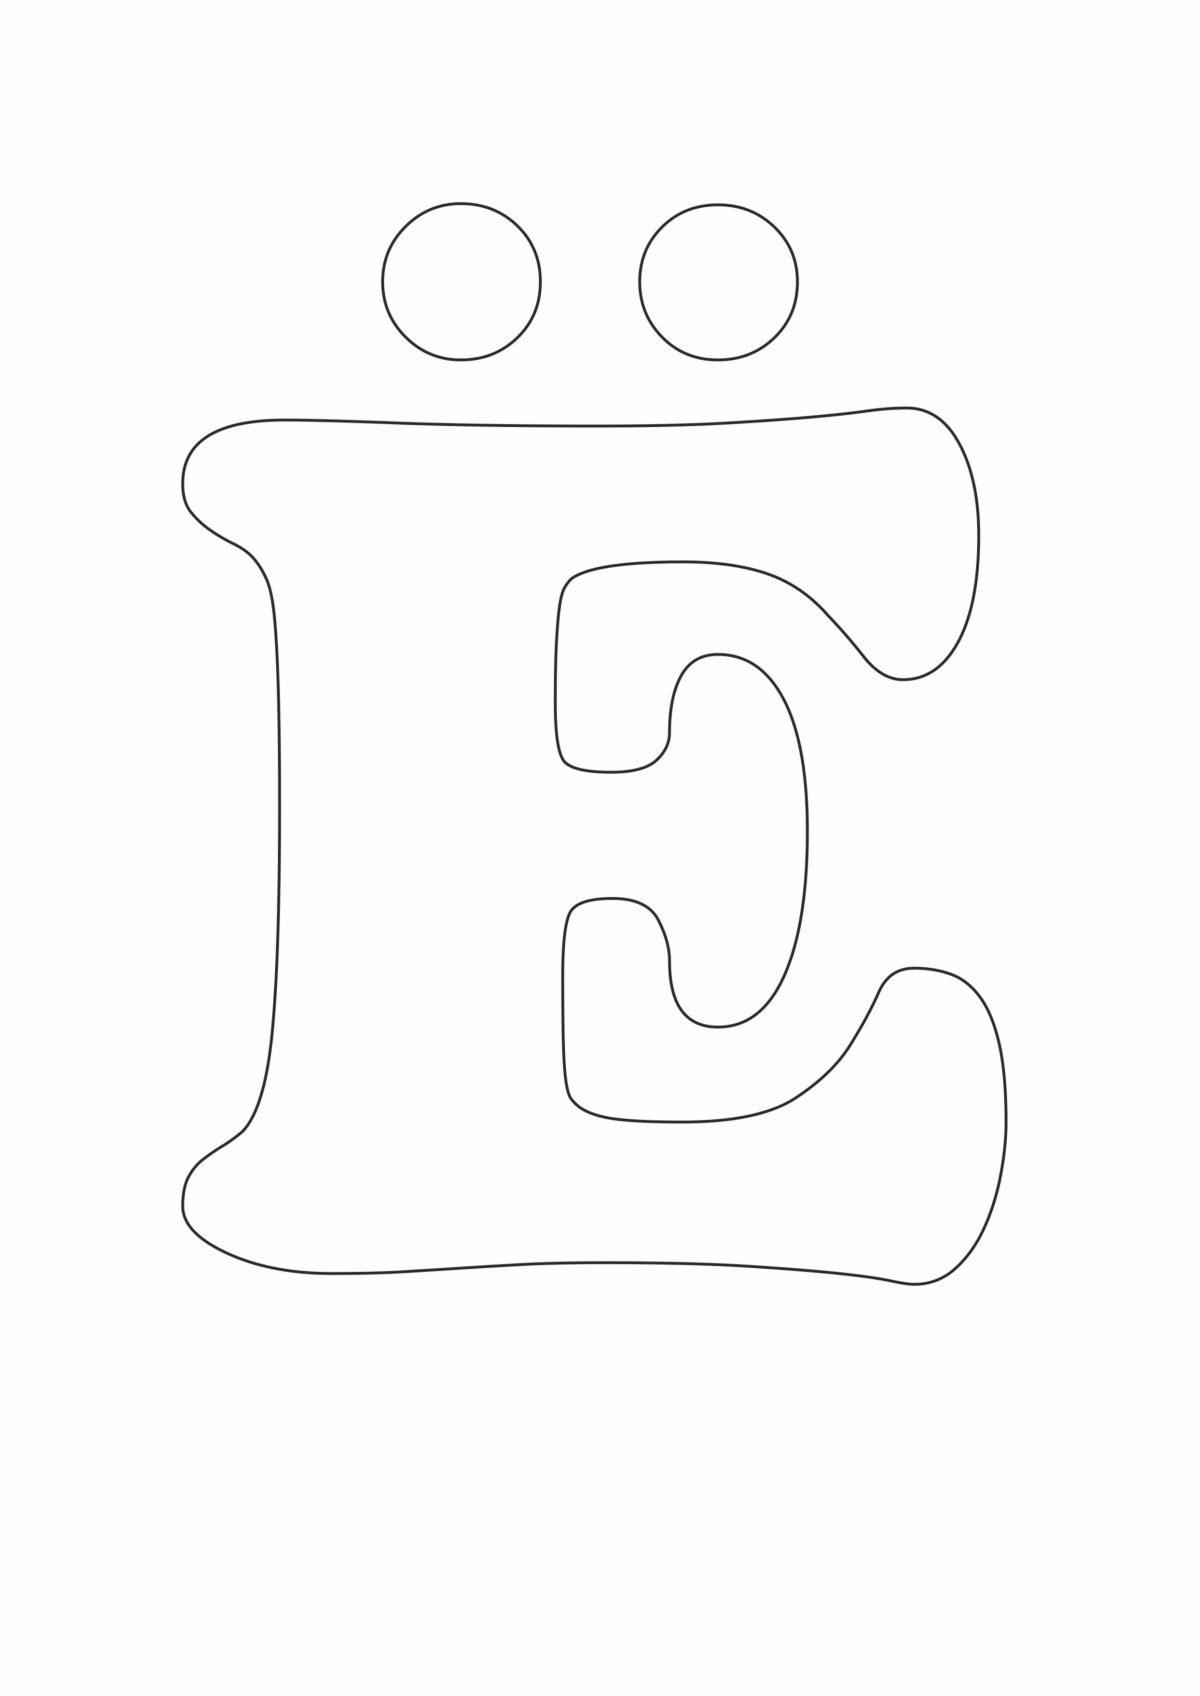 Трафарет буквы Ё